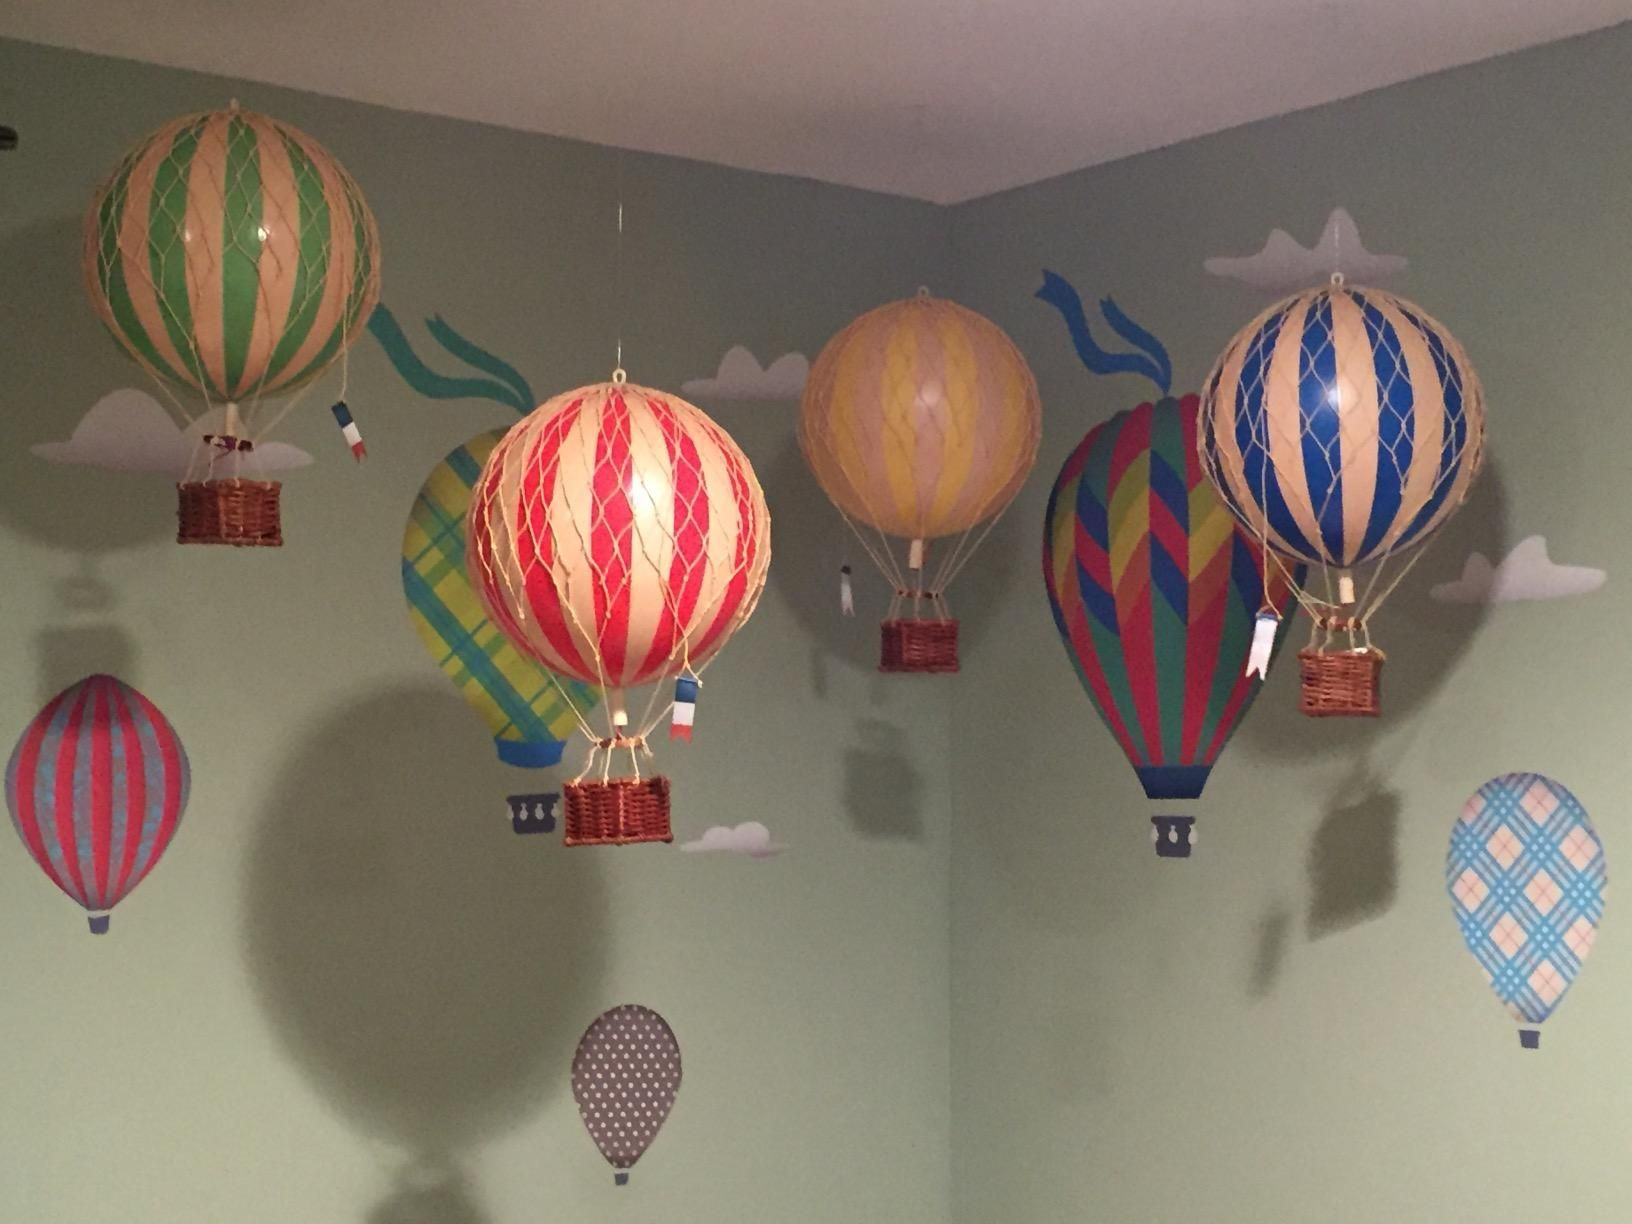 Amazon.com: Travels Light Hot Air Balloon (Blue